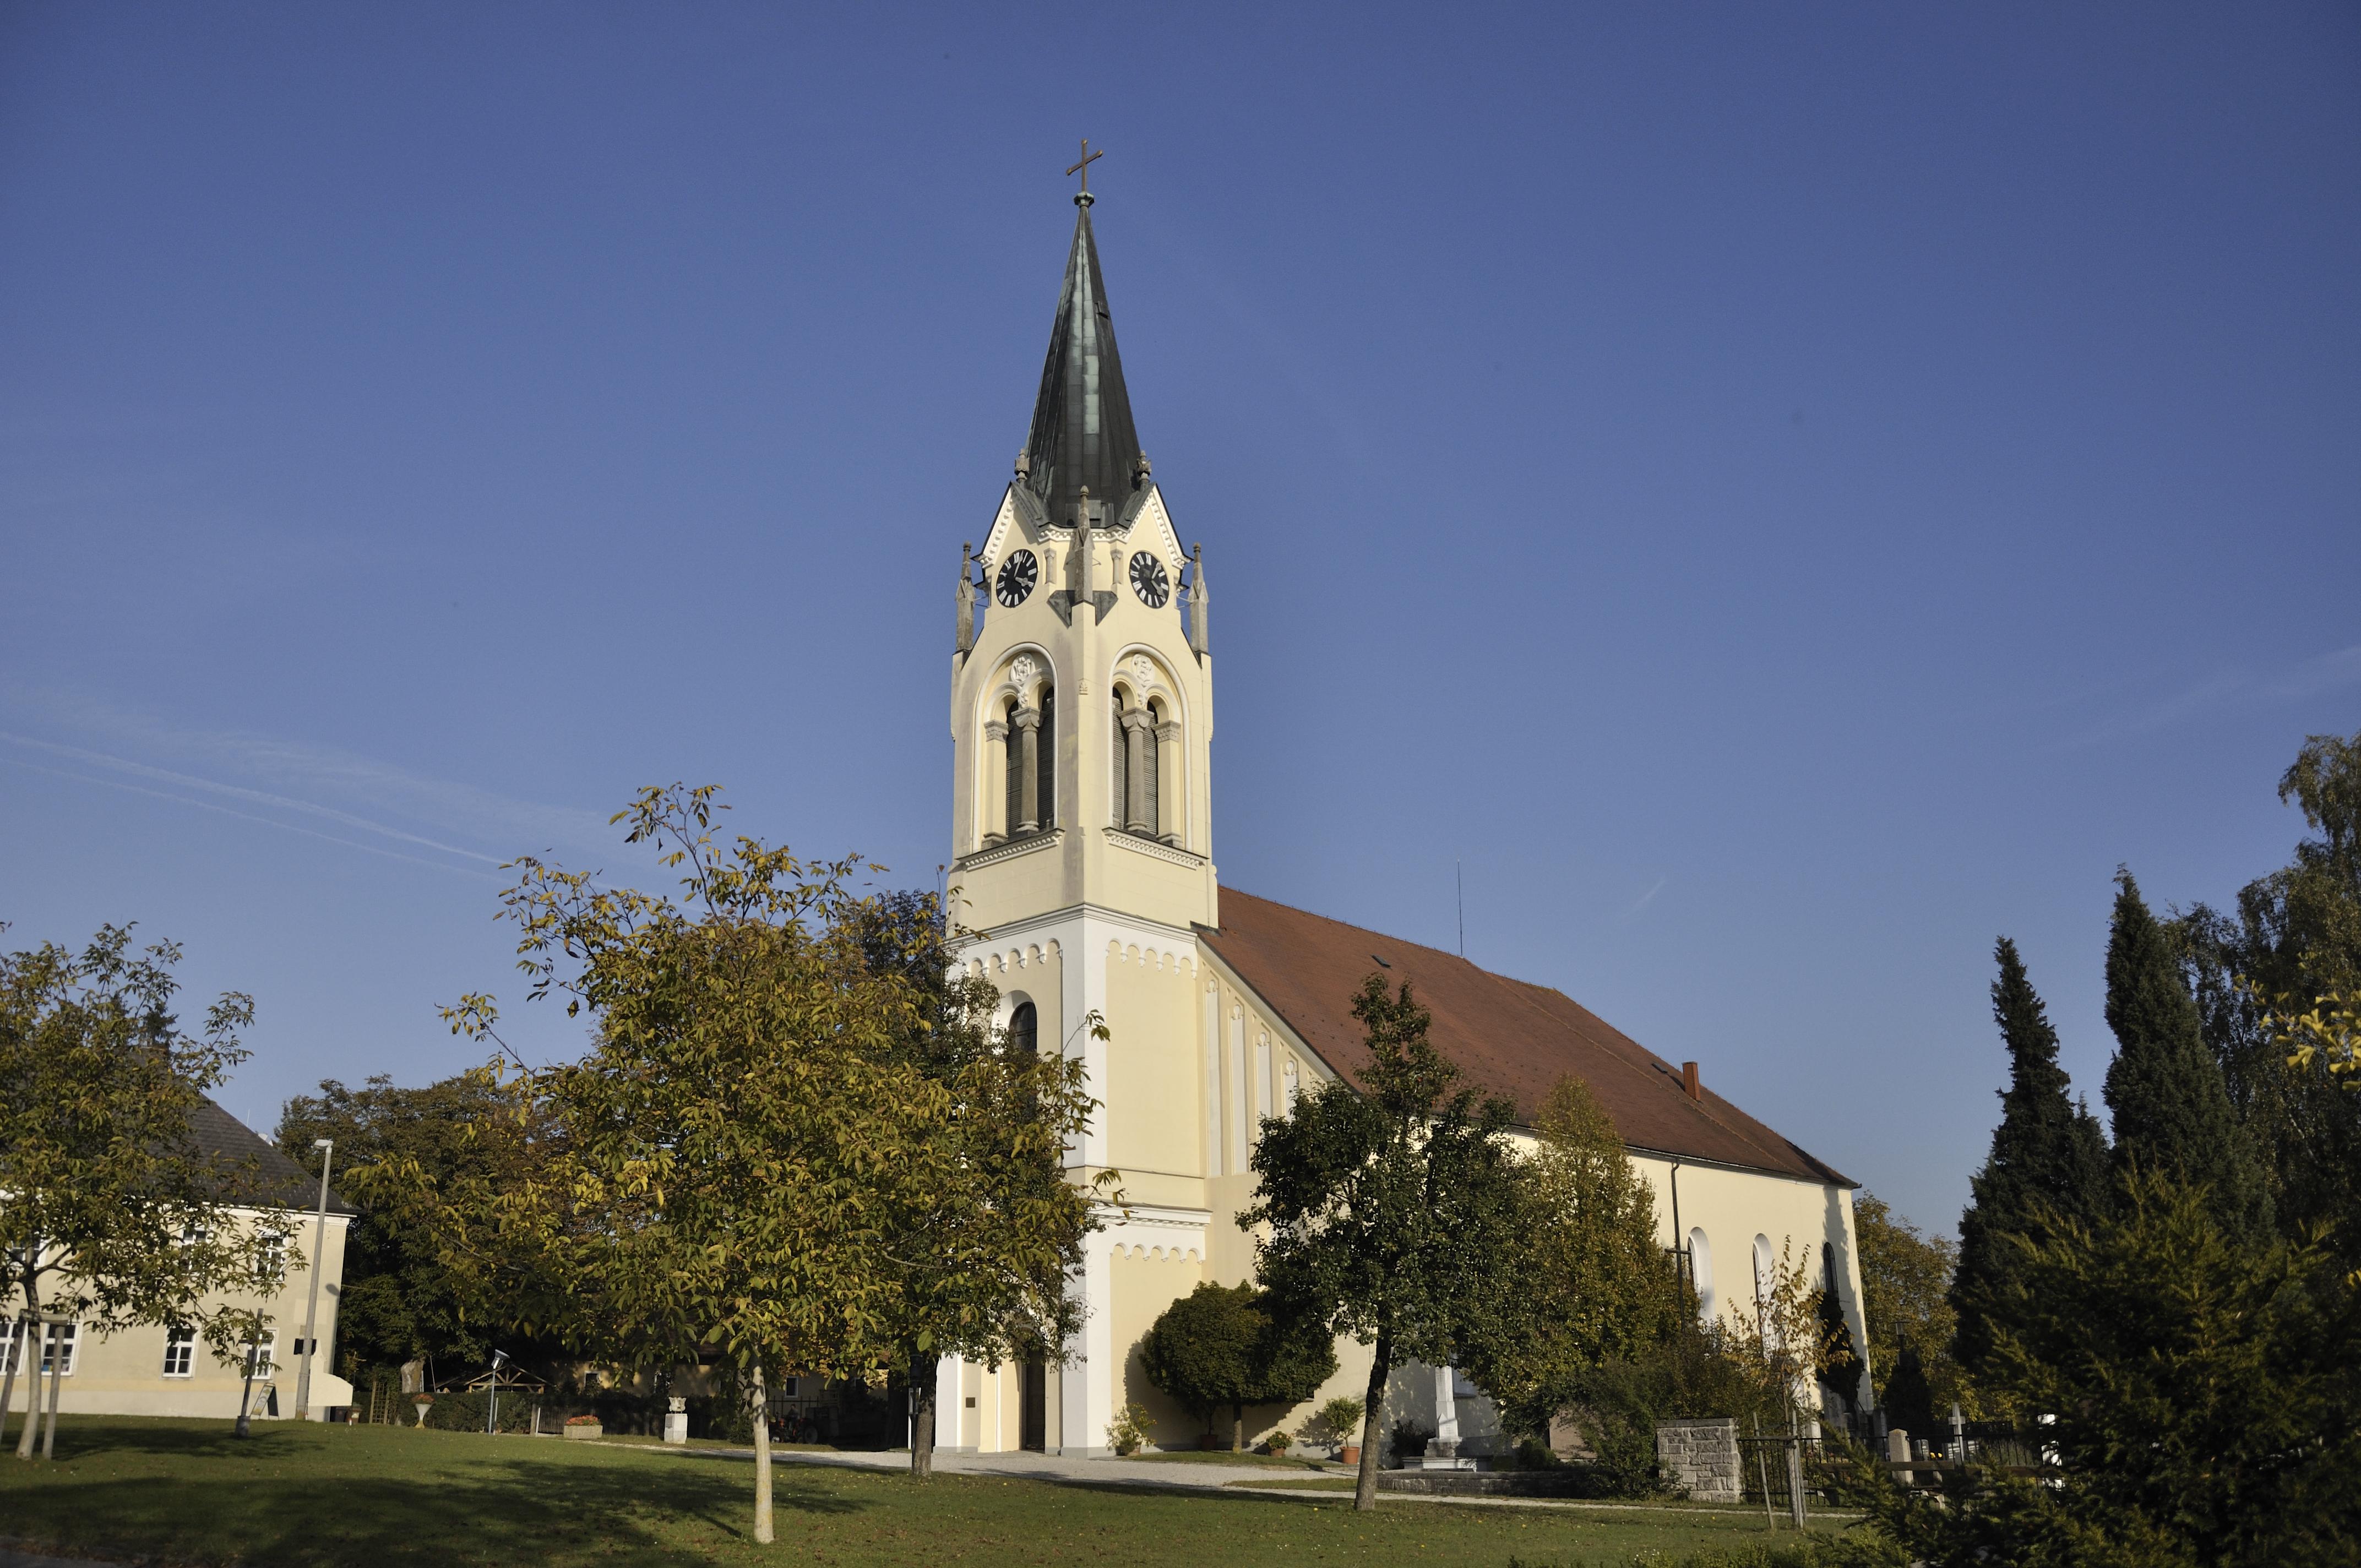 Kirchberg-thening christliche partnervermittlung - Dating den